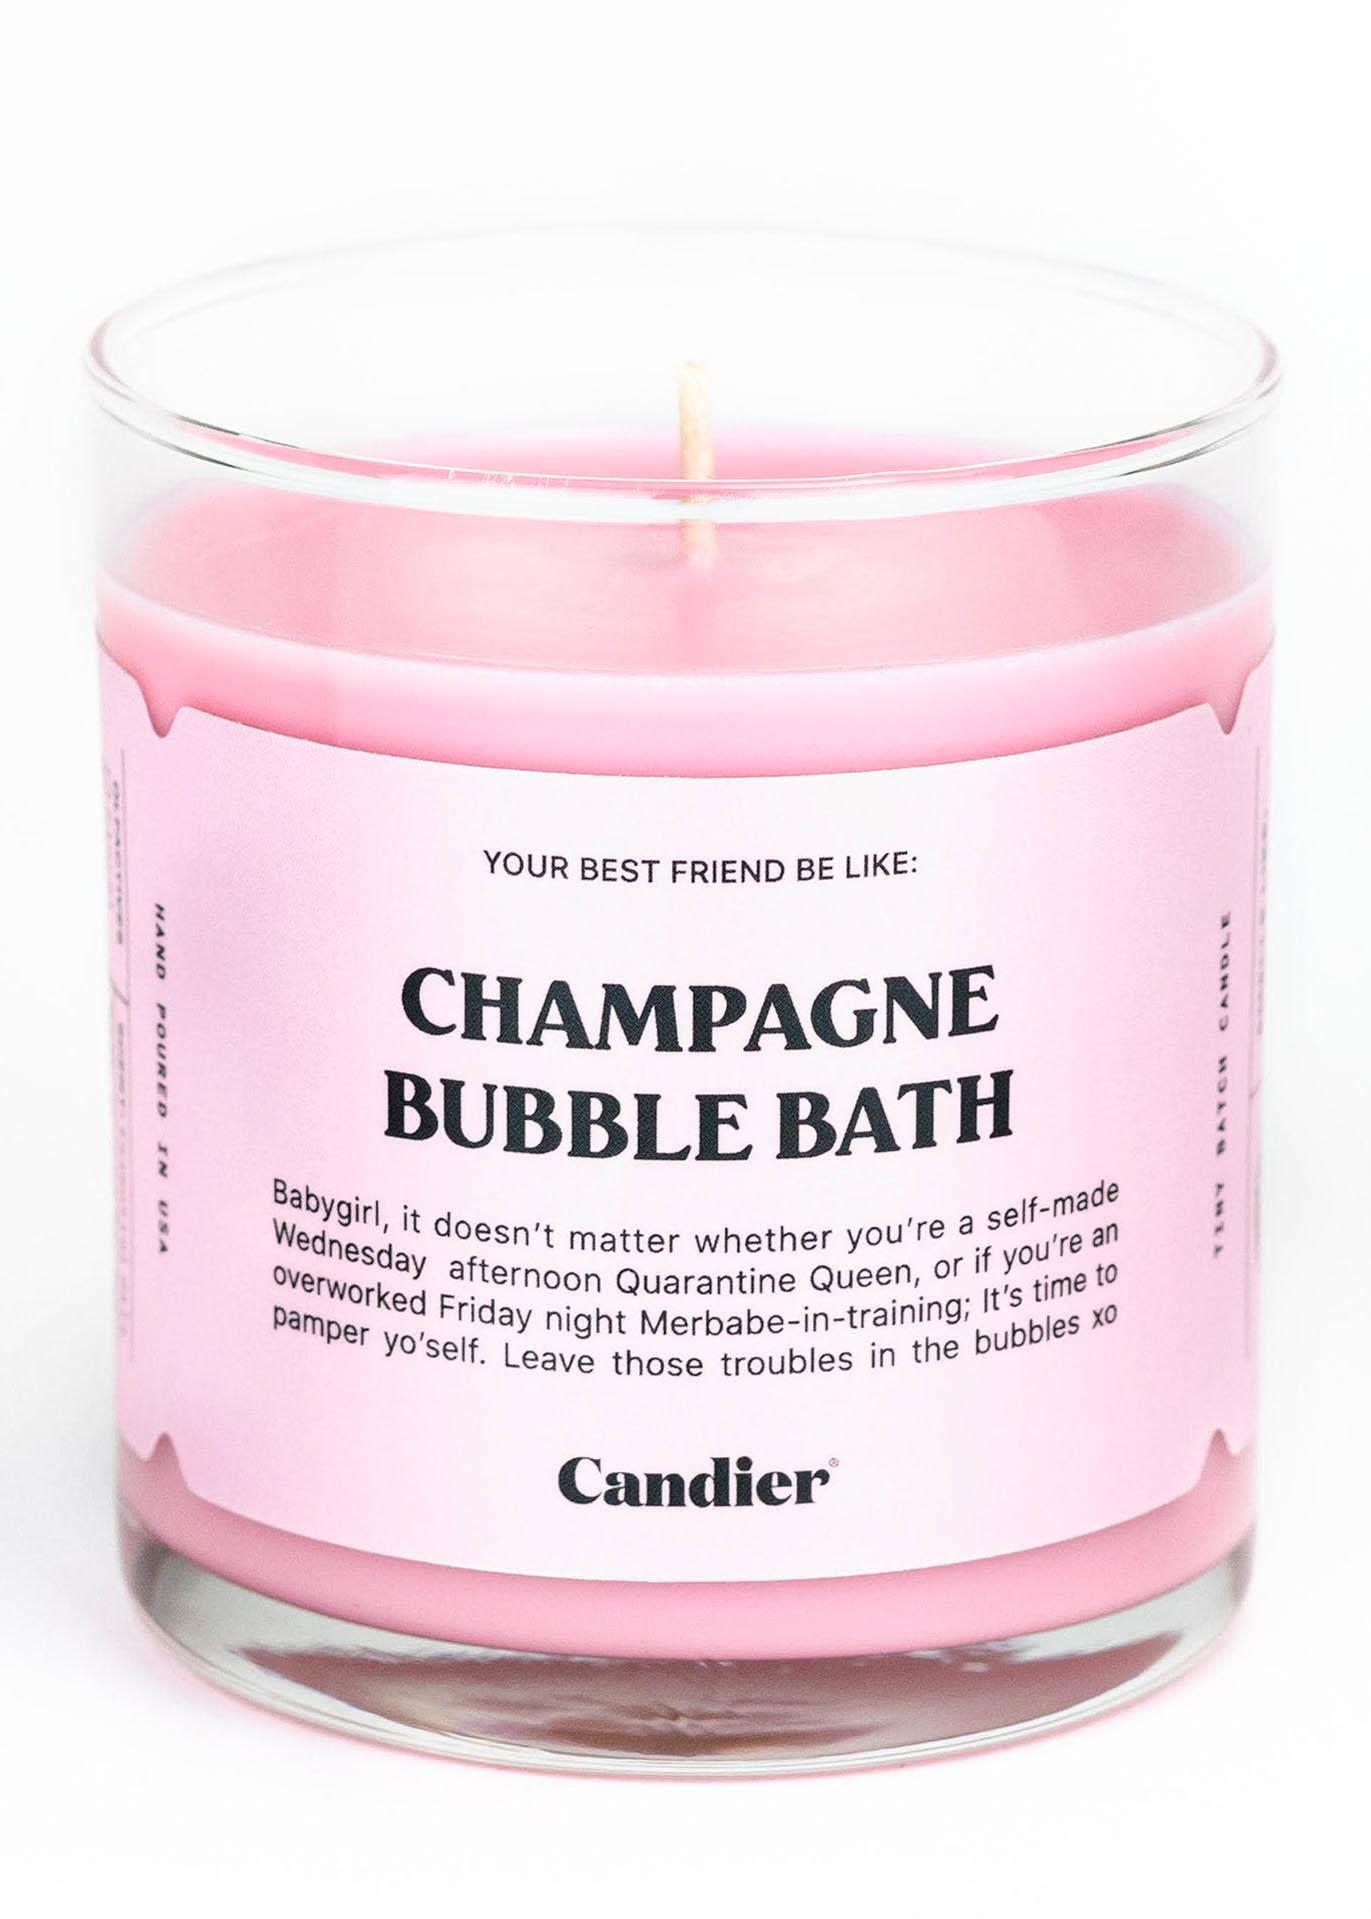 CHAMPAGNE BUBBLE BATH CANDLE